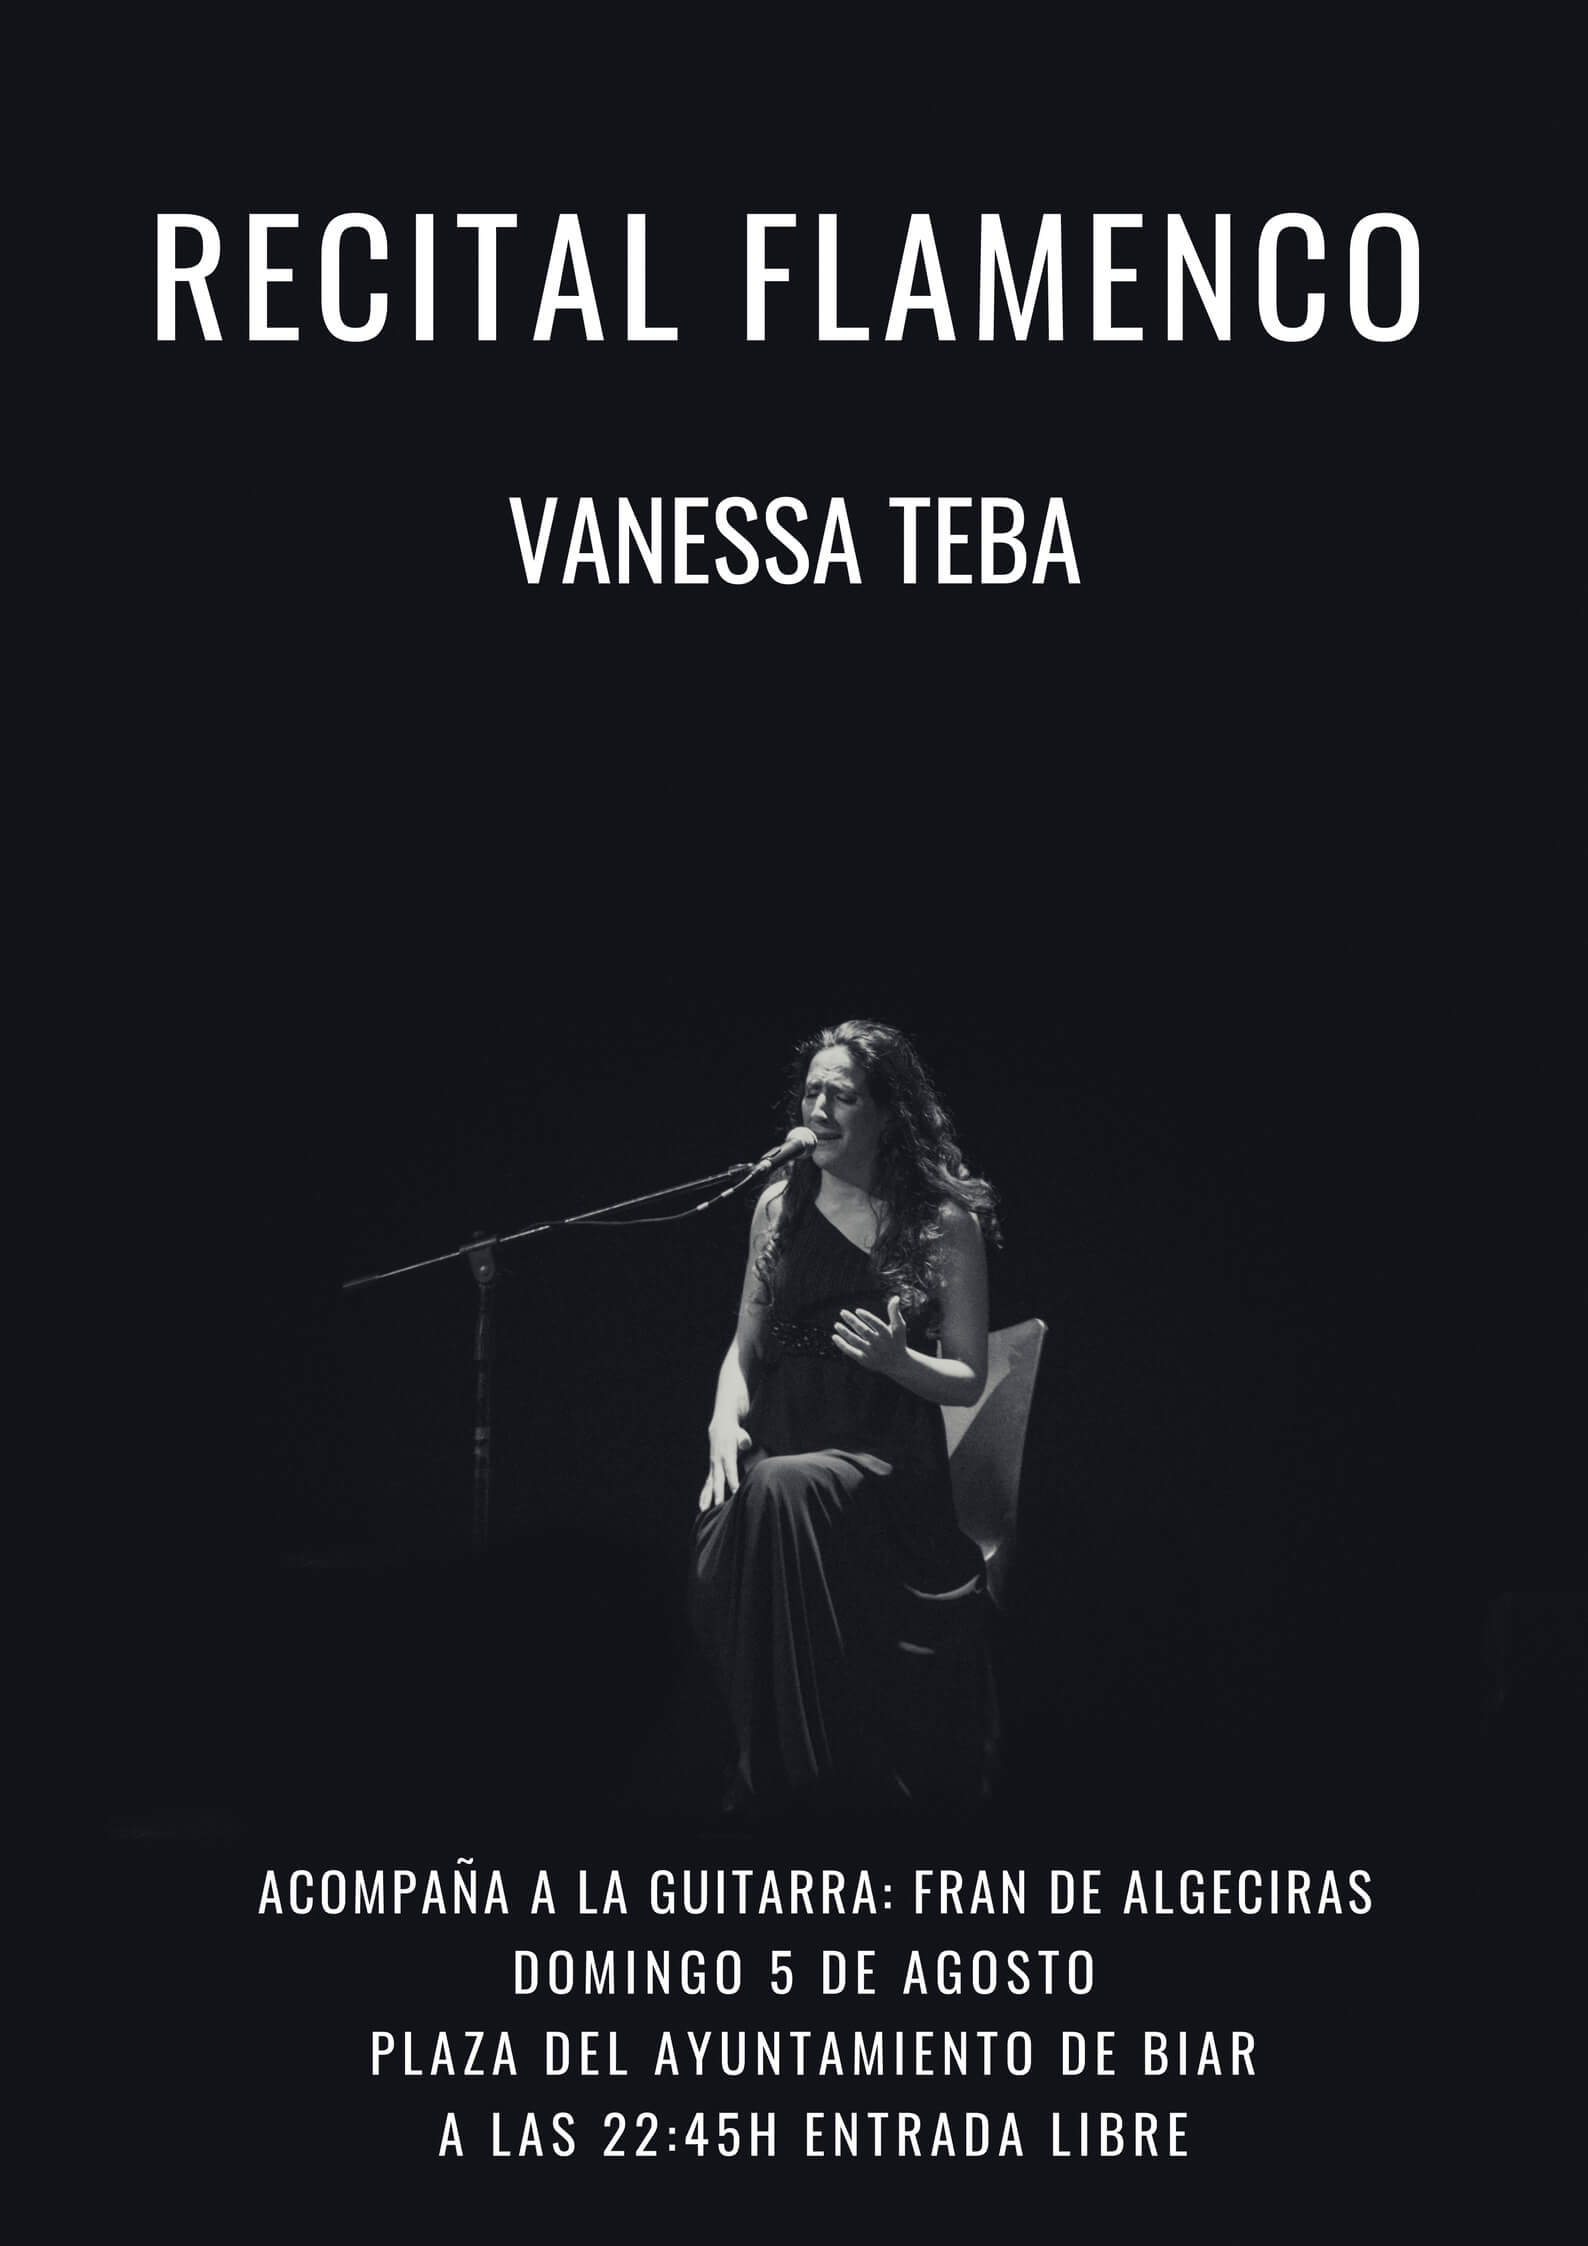 Vanessa Teba recital flamenco Biar-Alicante